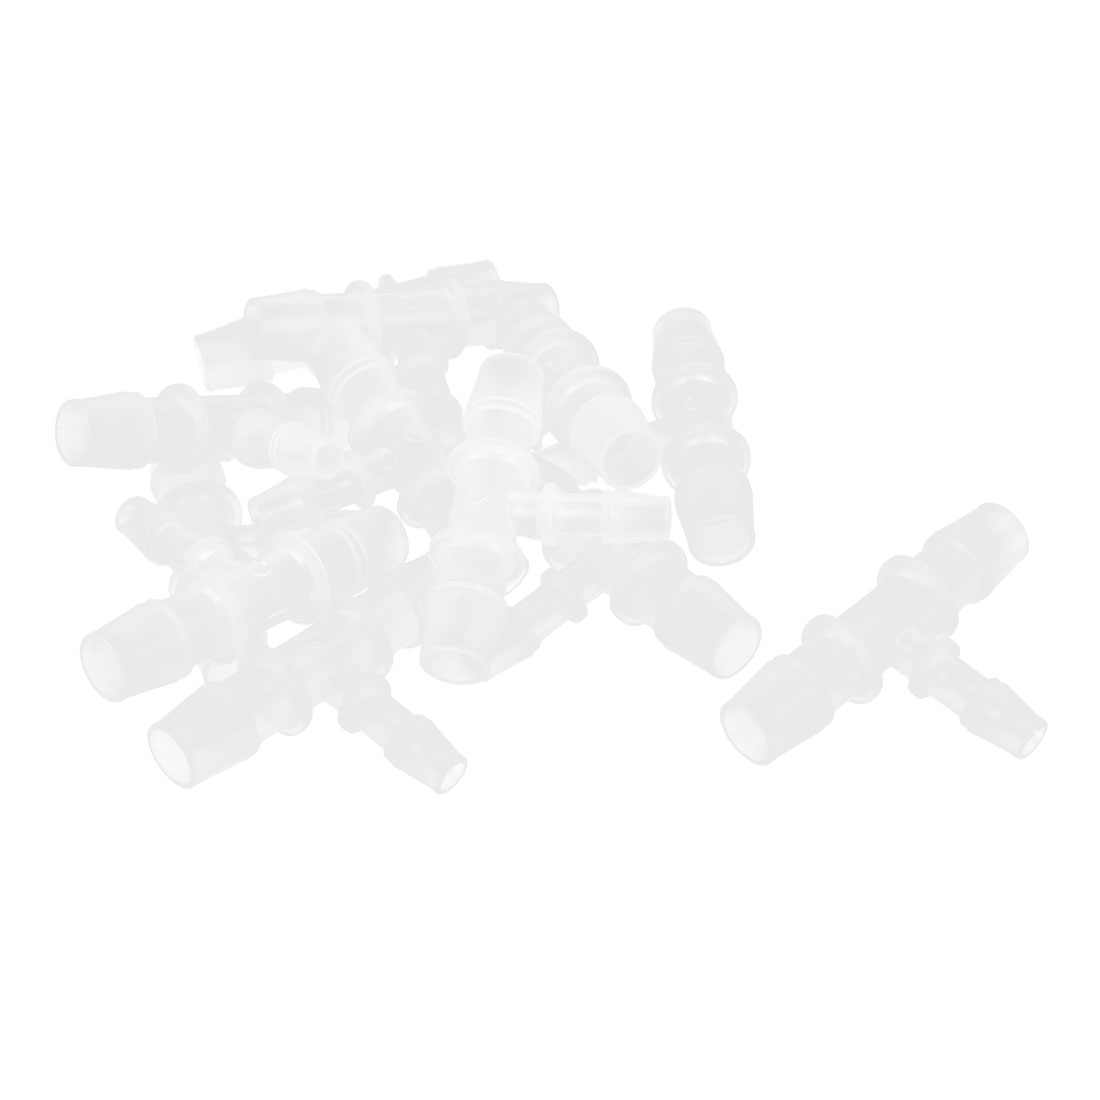 12 Pcs Clear White Plastic T Shape 3 Way Aquarium Fish Tank Water Tubing Connectors